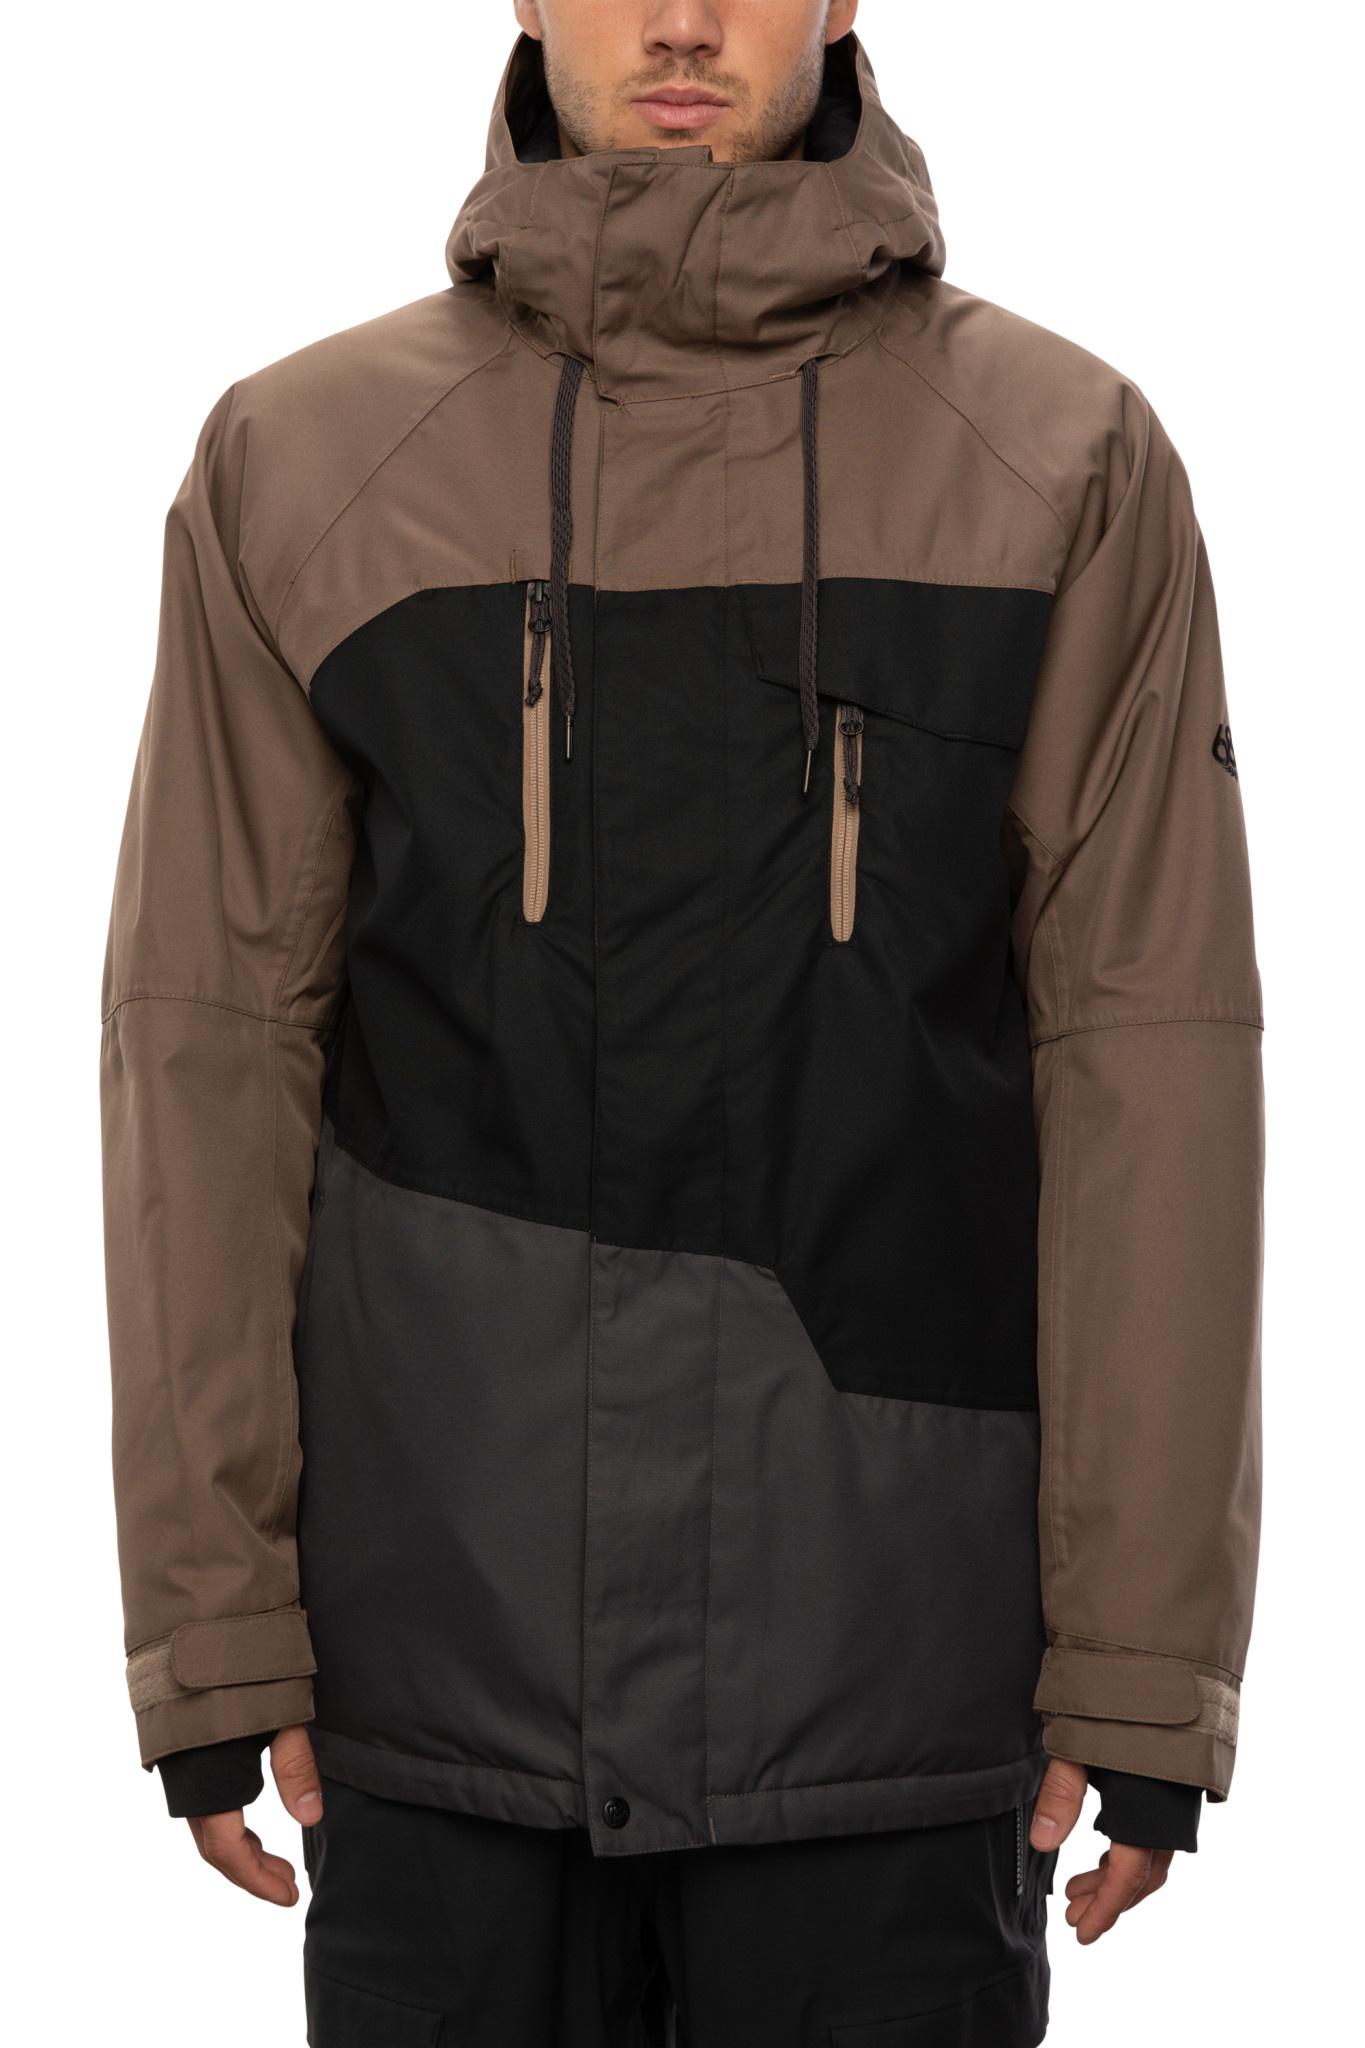 686 686 M's Geo Insulated Jacket